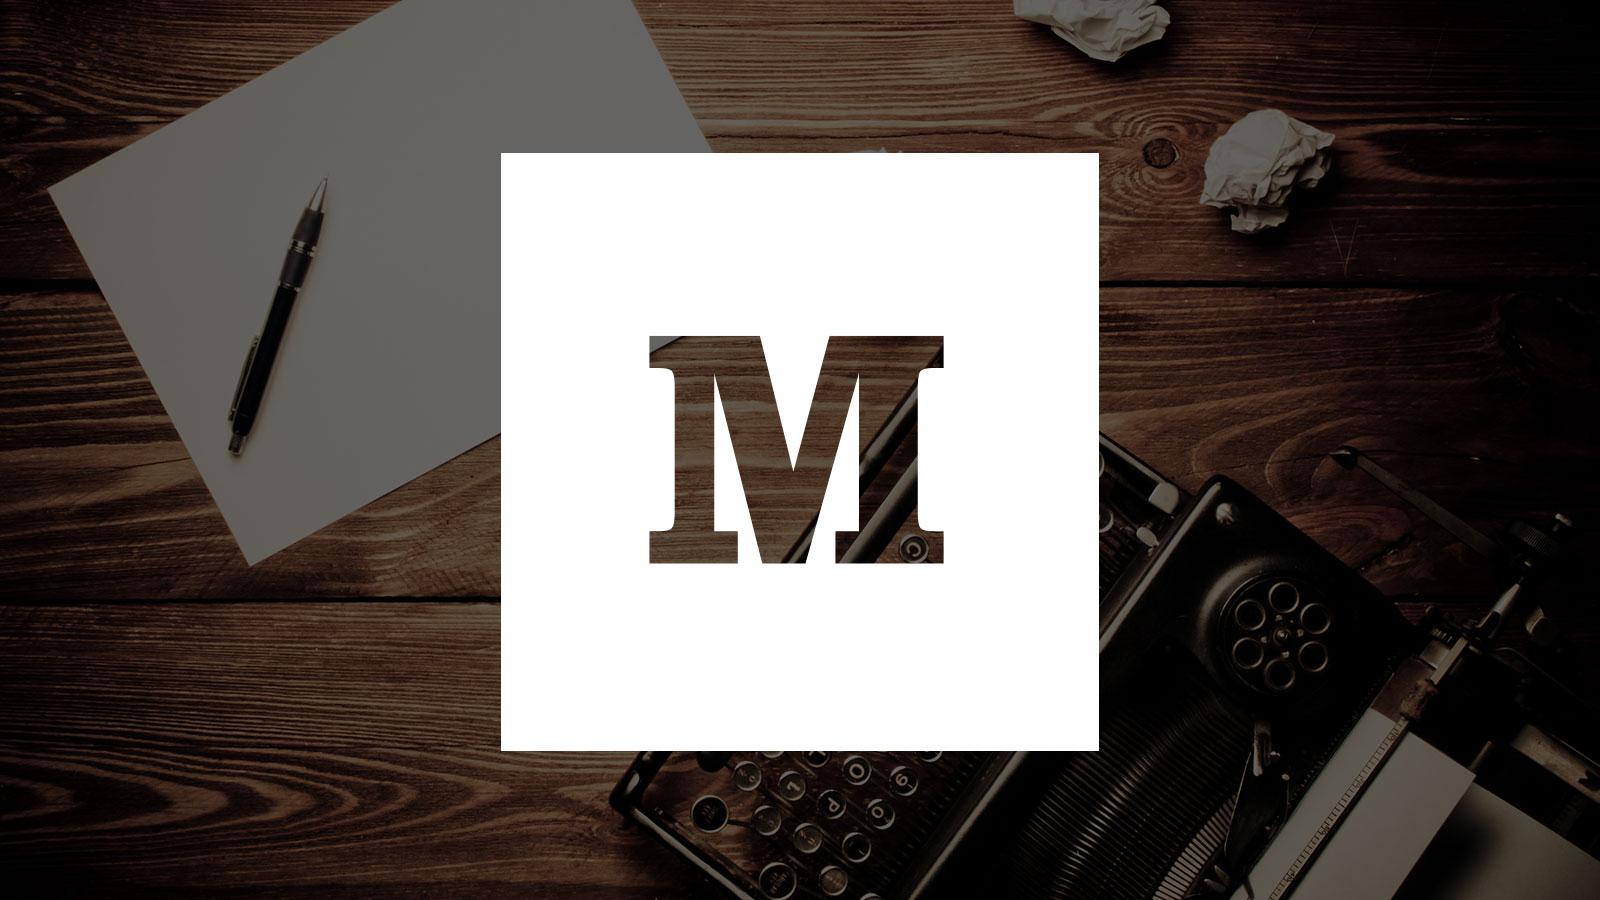 Write An Publish High Quality Guest Post On Medium Da 92 Pa 93